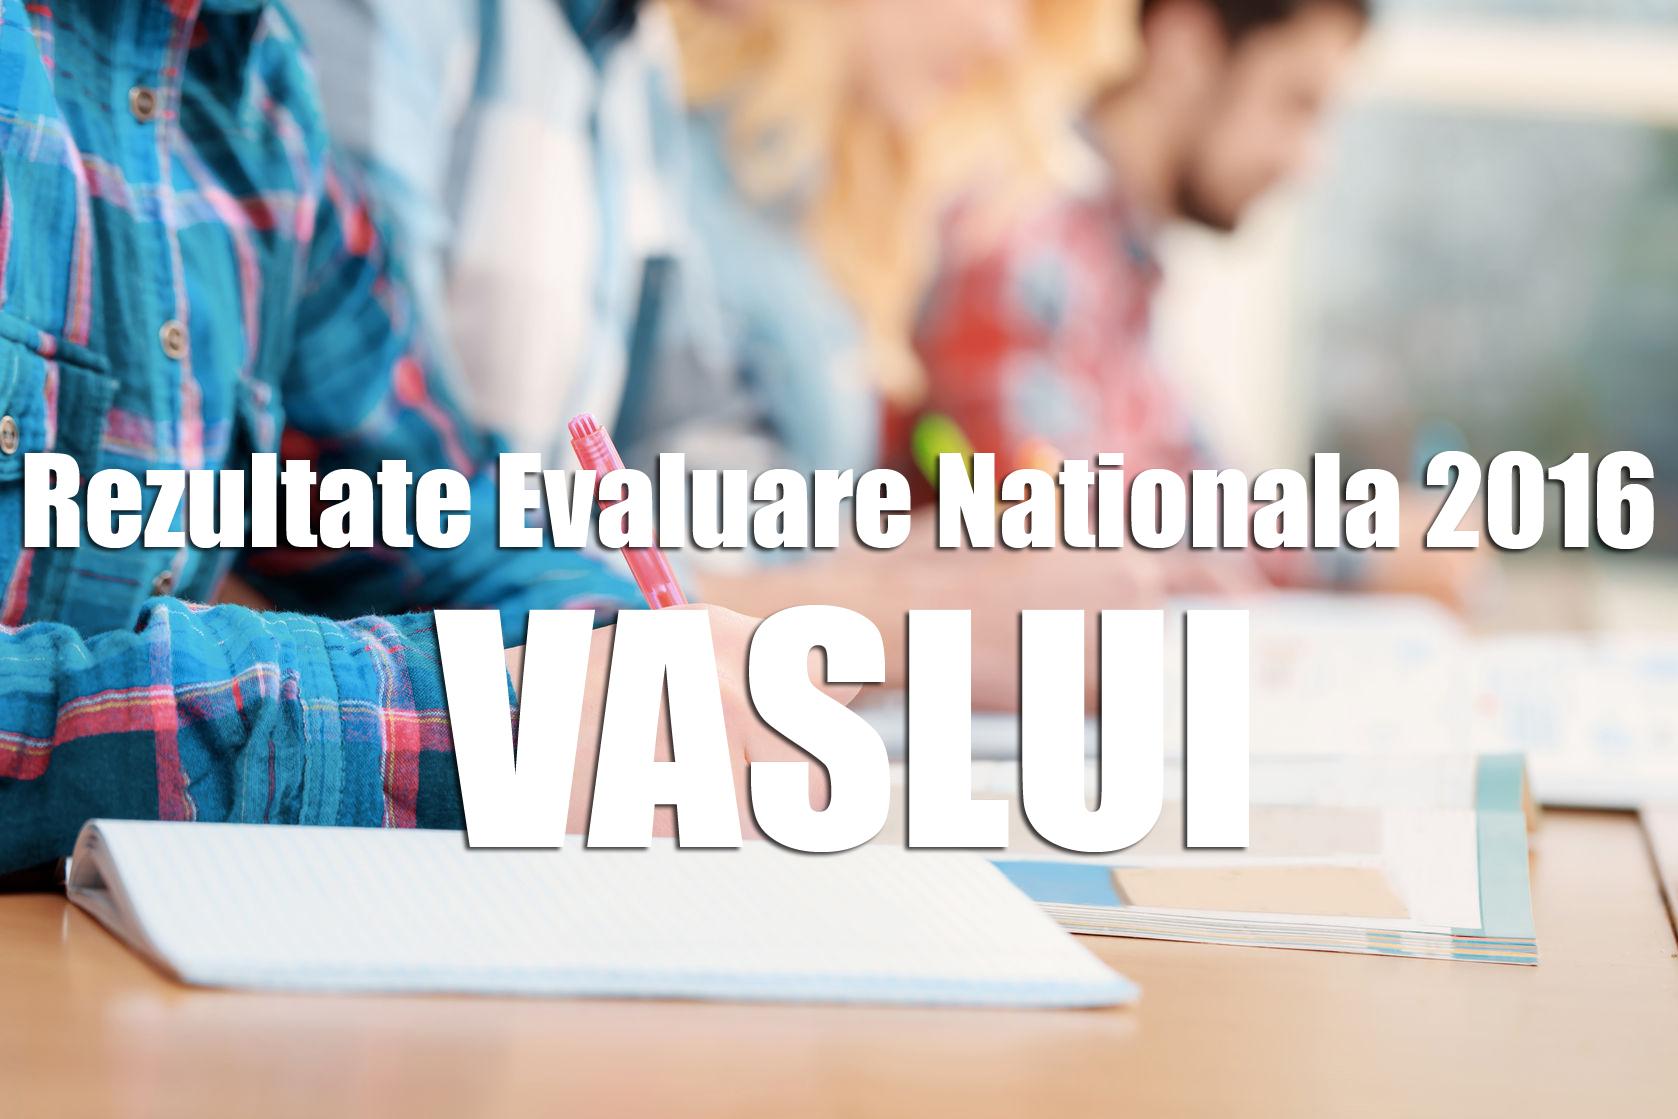 Rezultate-Evaluare-Nationala-2016-vaslui